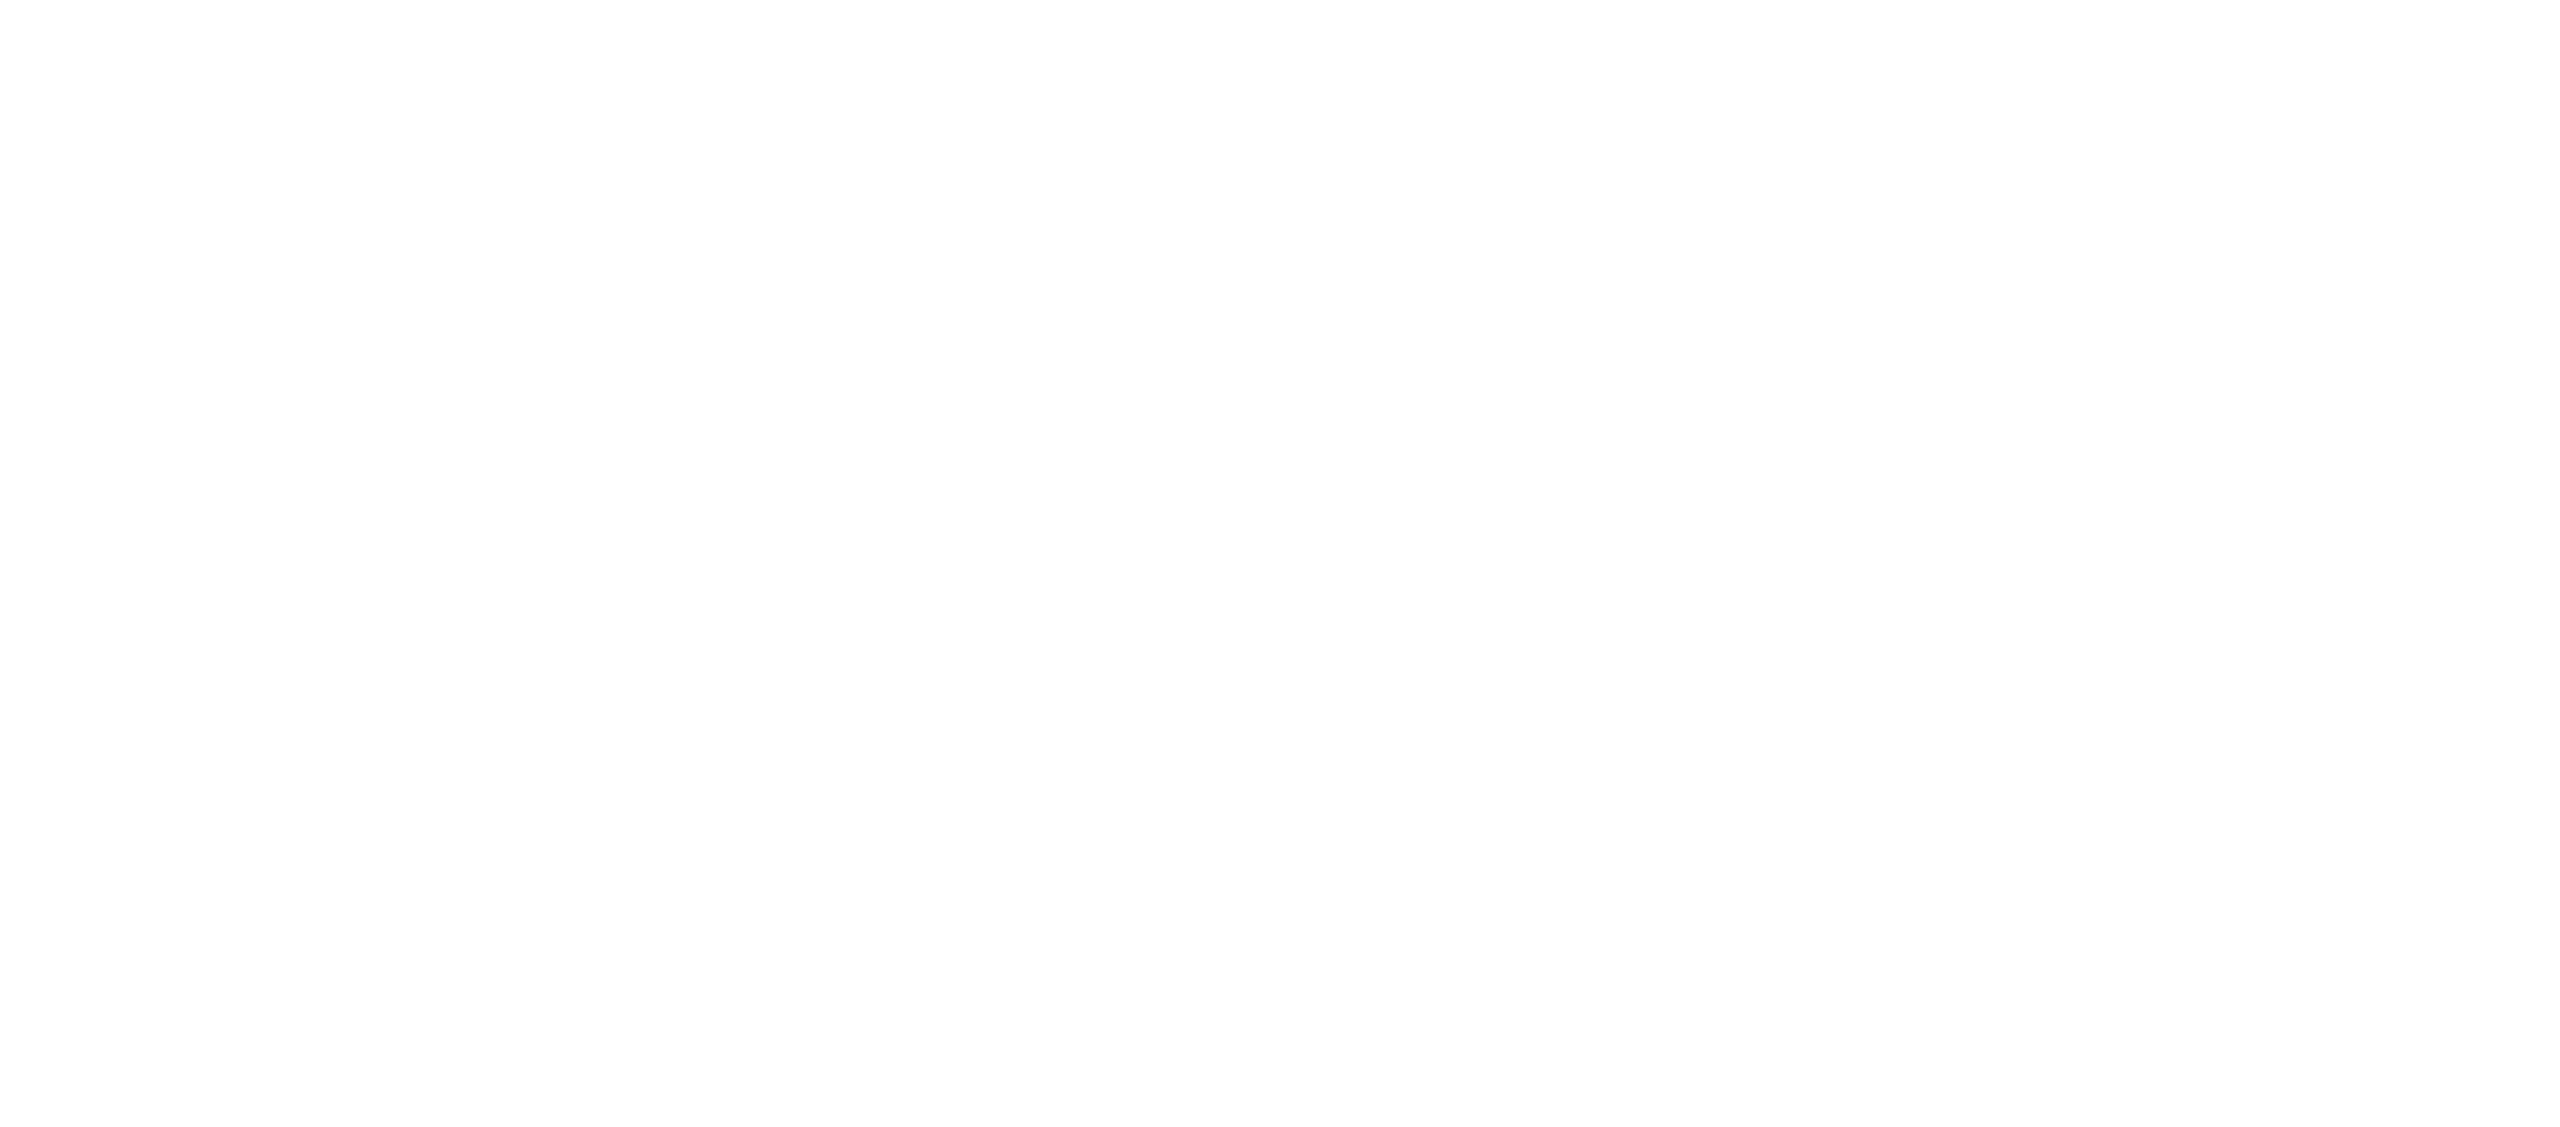 Henri Pullman